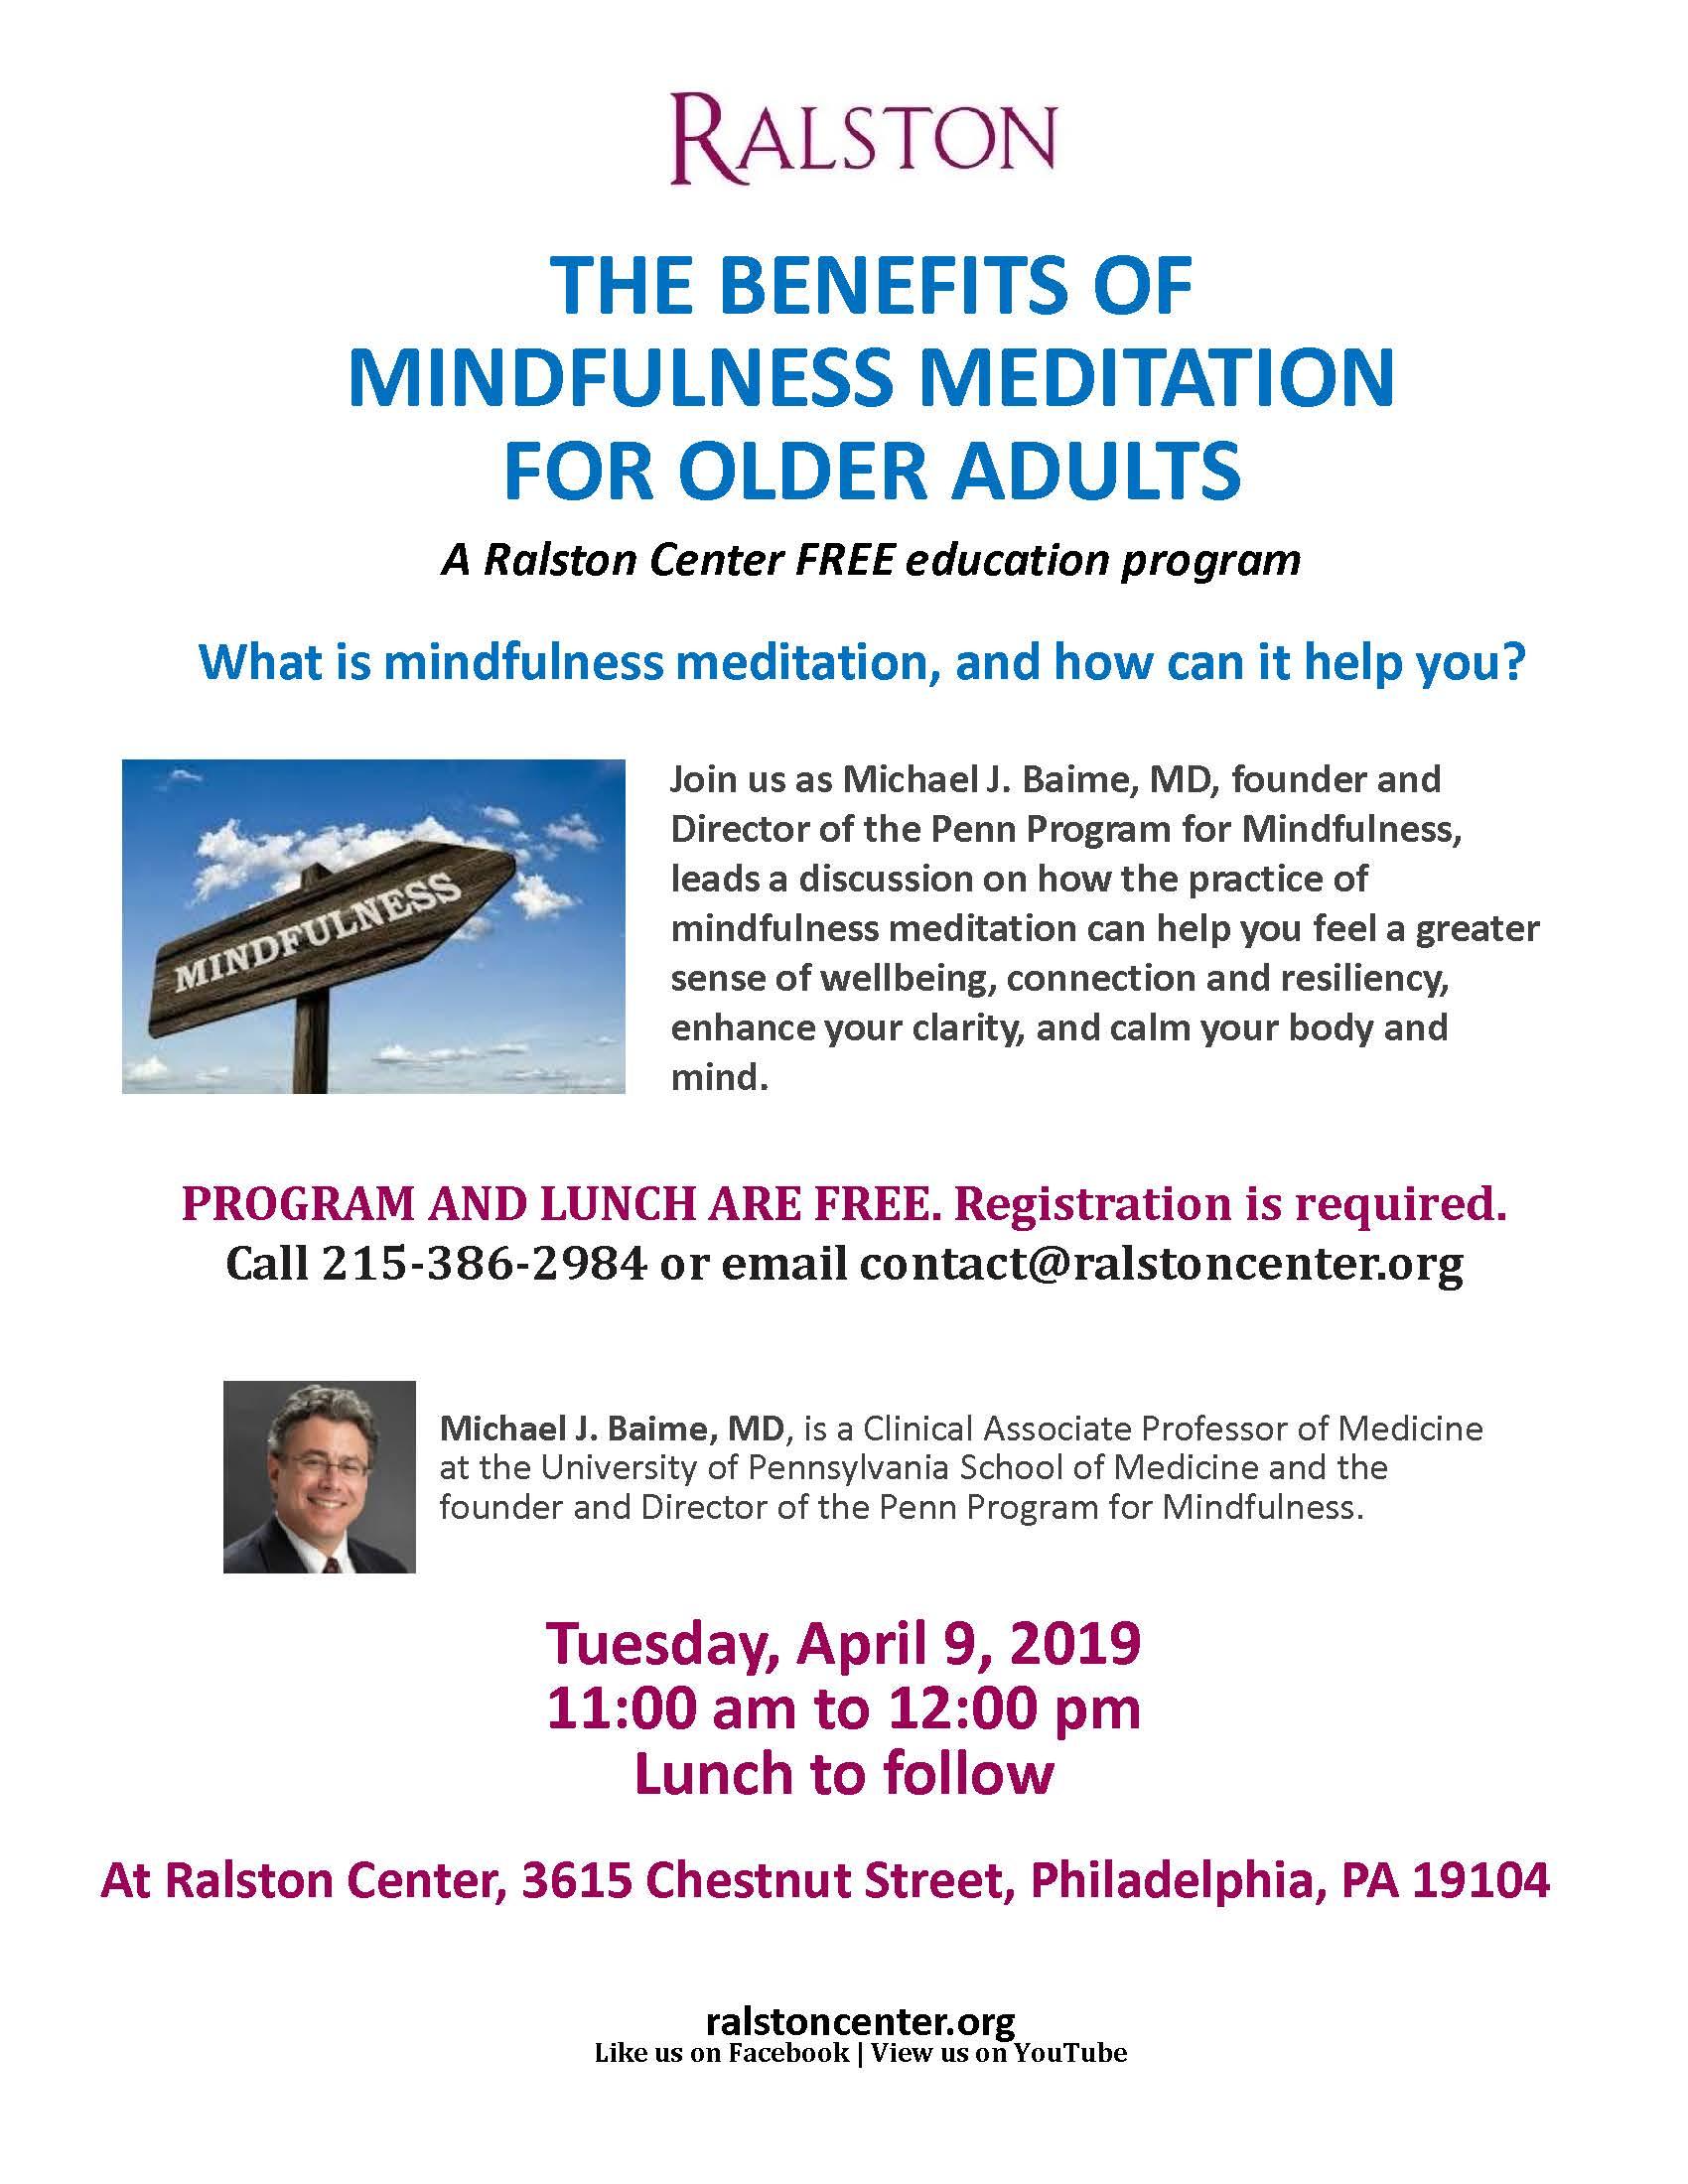 Free Talk On Mindfulness Practice For >> Rc Mindfulness Meditation Program 4 9 19 Ralston